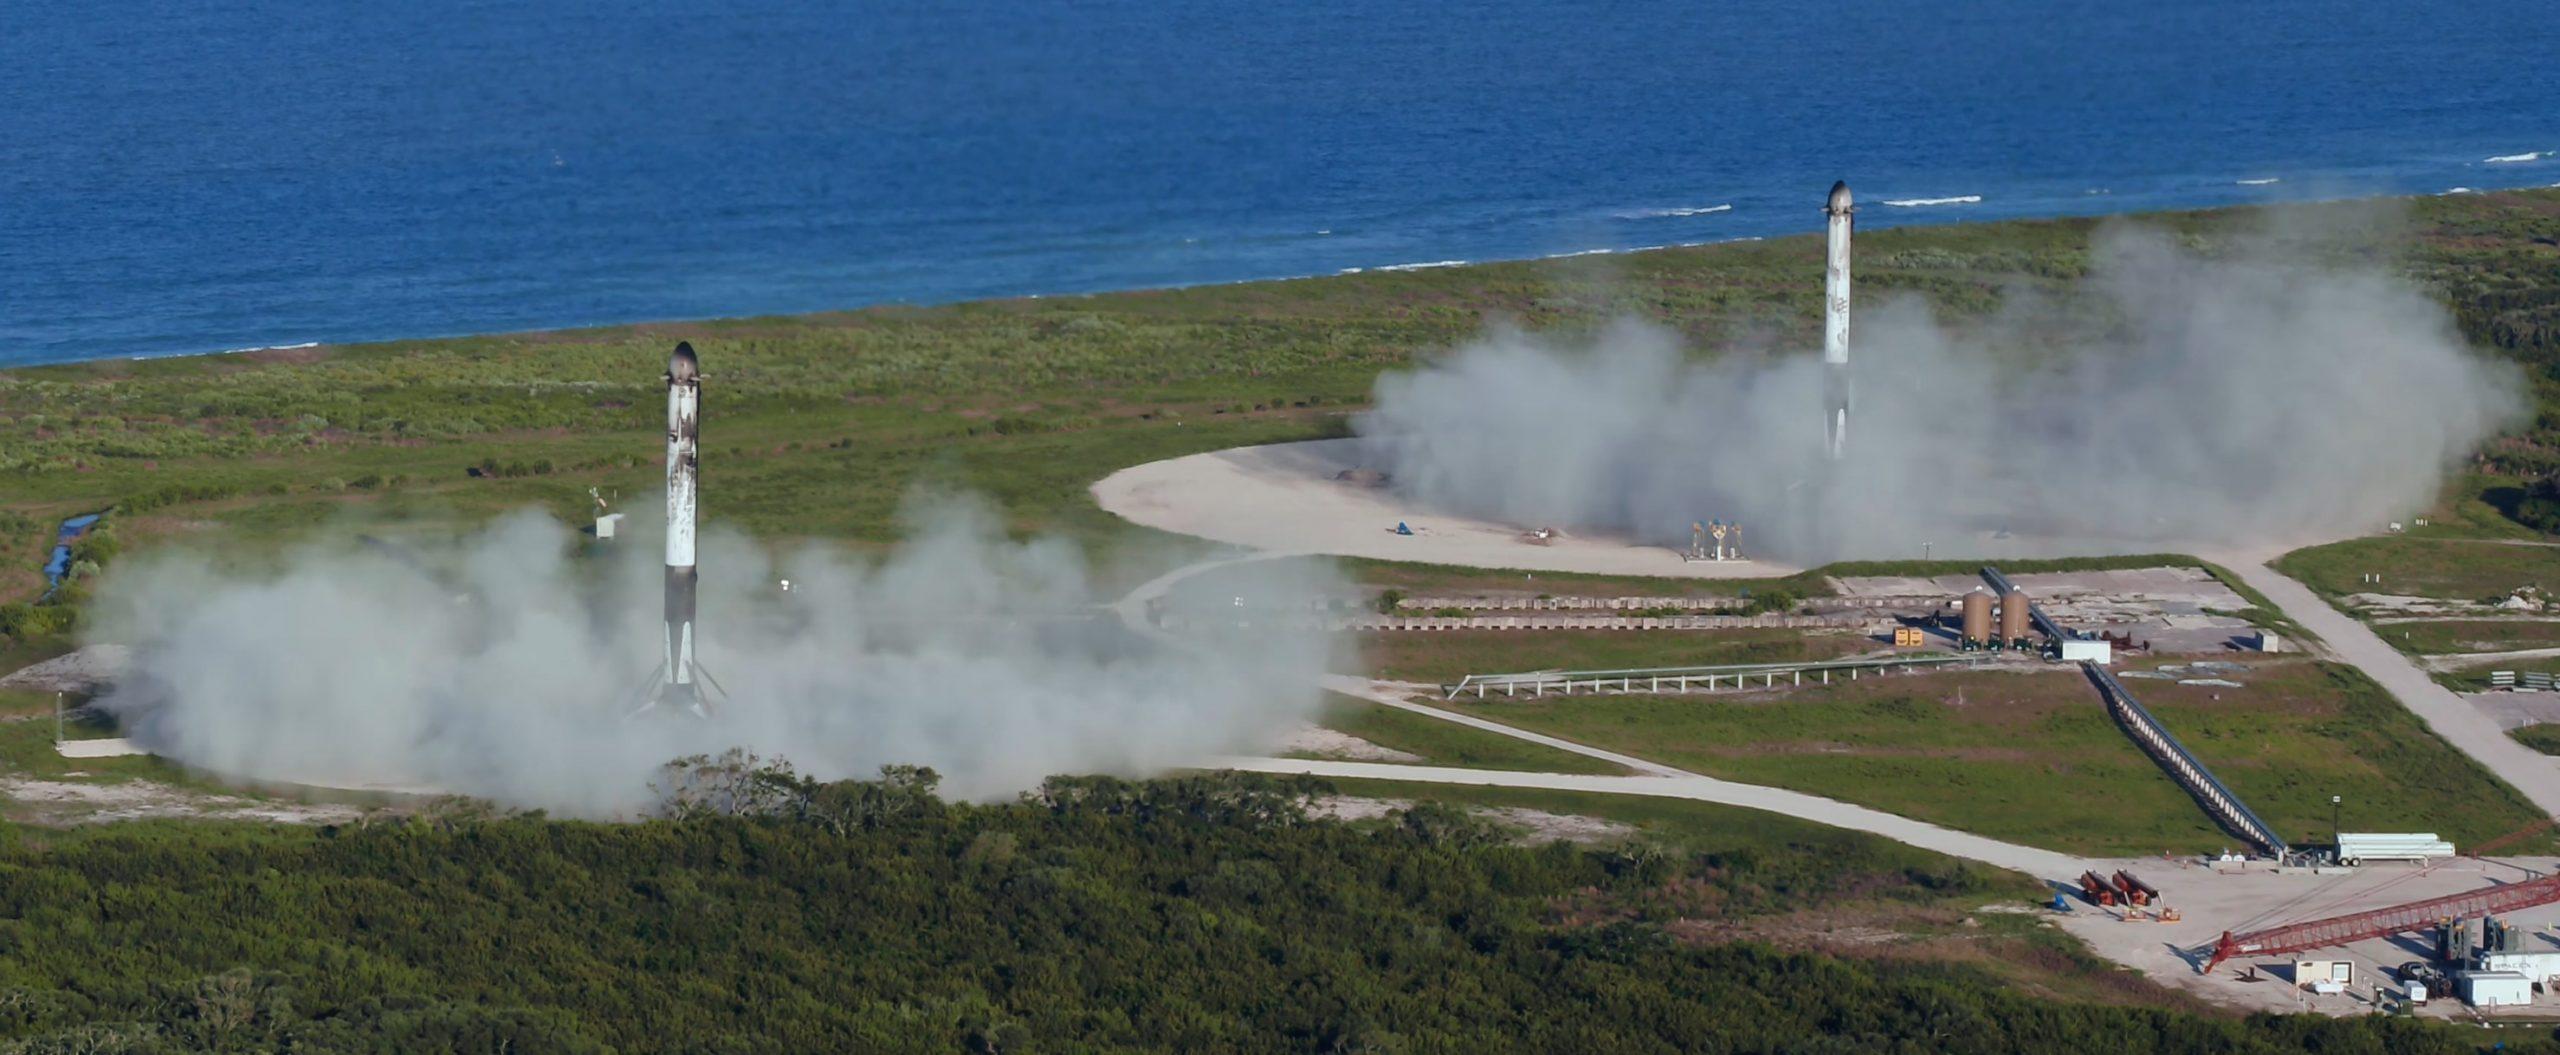 Falcon Heavy Arabsat 6A B1052 B1053 LZ-1 LZ-2 041120 (SpaceX) 2